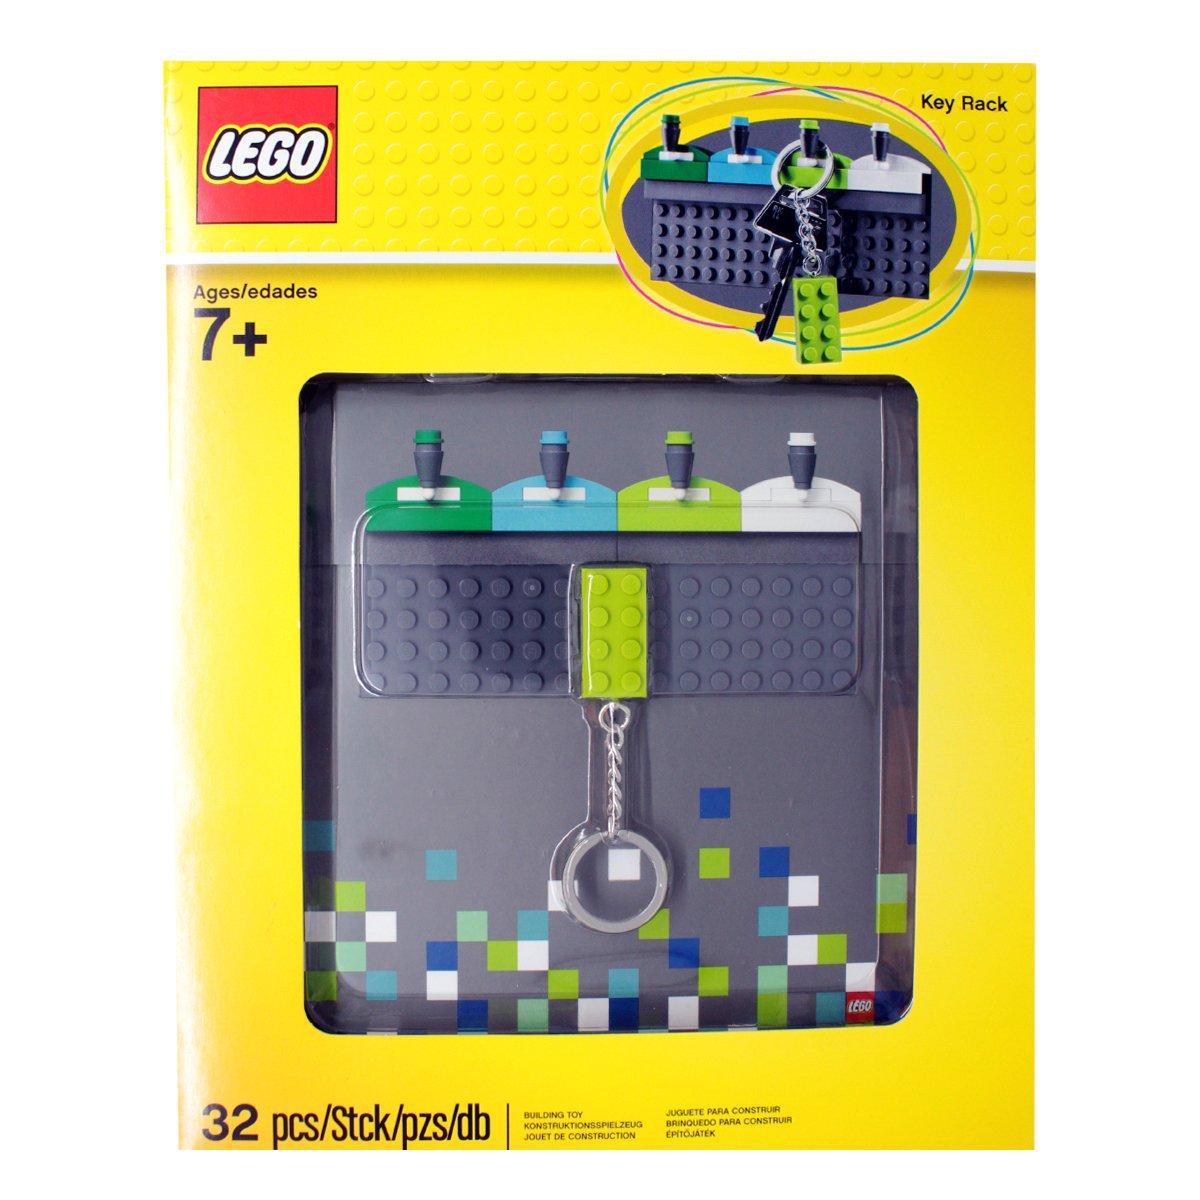 Amazon.com: LEGO Key Rack 853580: Toys & Games